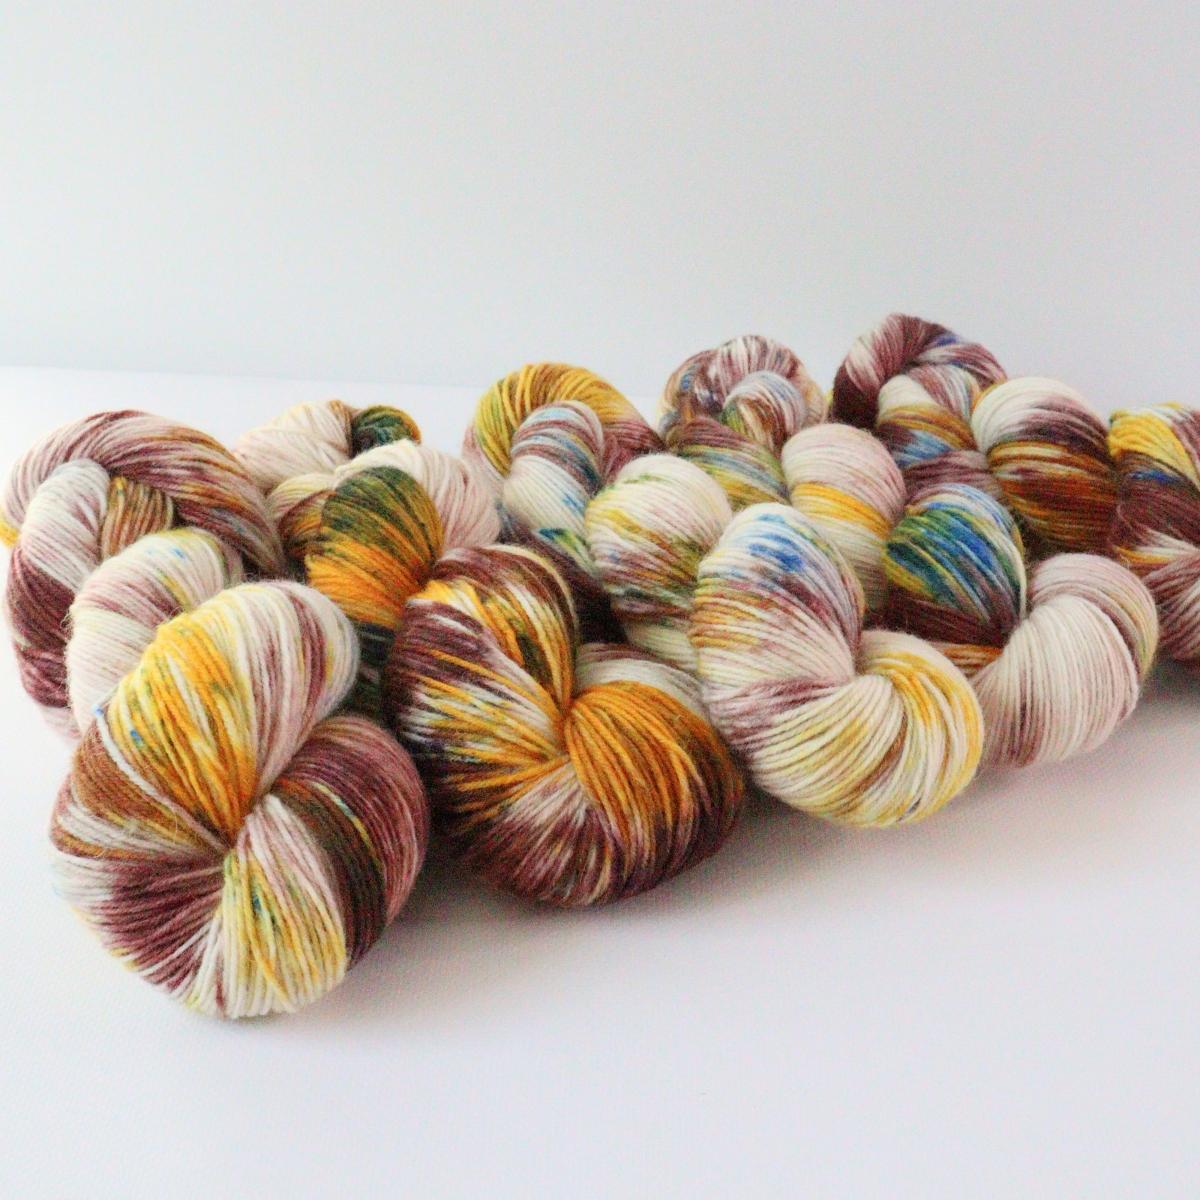 woodico.pro hand dyed yarn 089 2 1200x1200 - Hand dyed yarn / 089